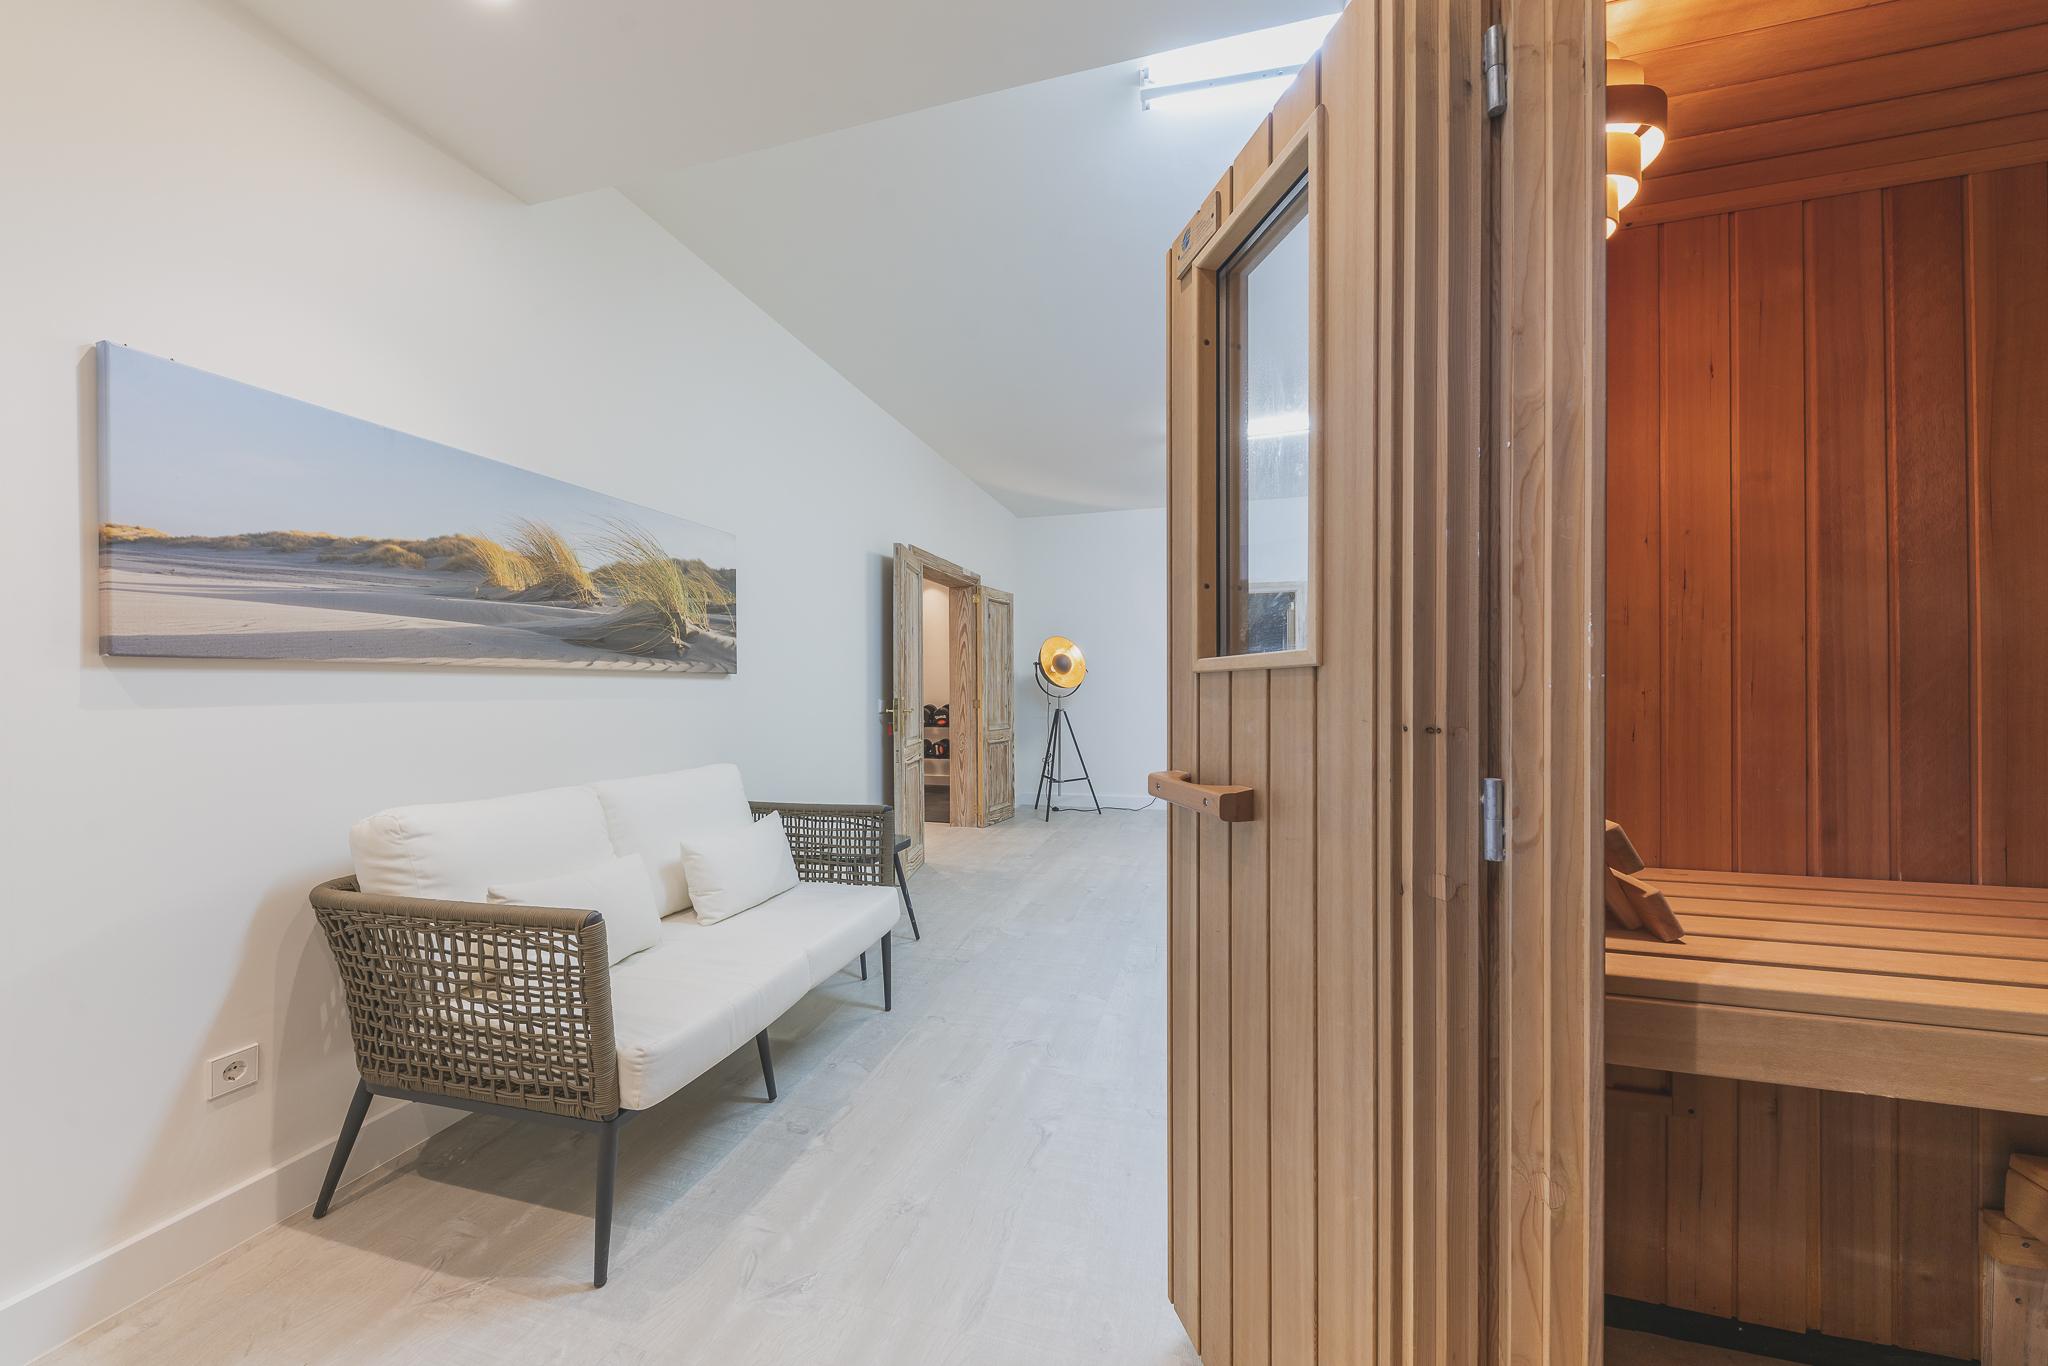 Apartment Luxury villa Luna  piscina climatizada  wi-fi  gym  sauna photo 20393758